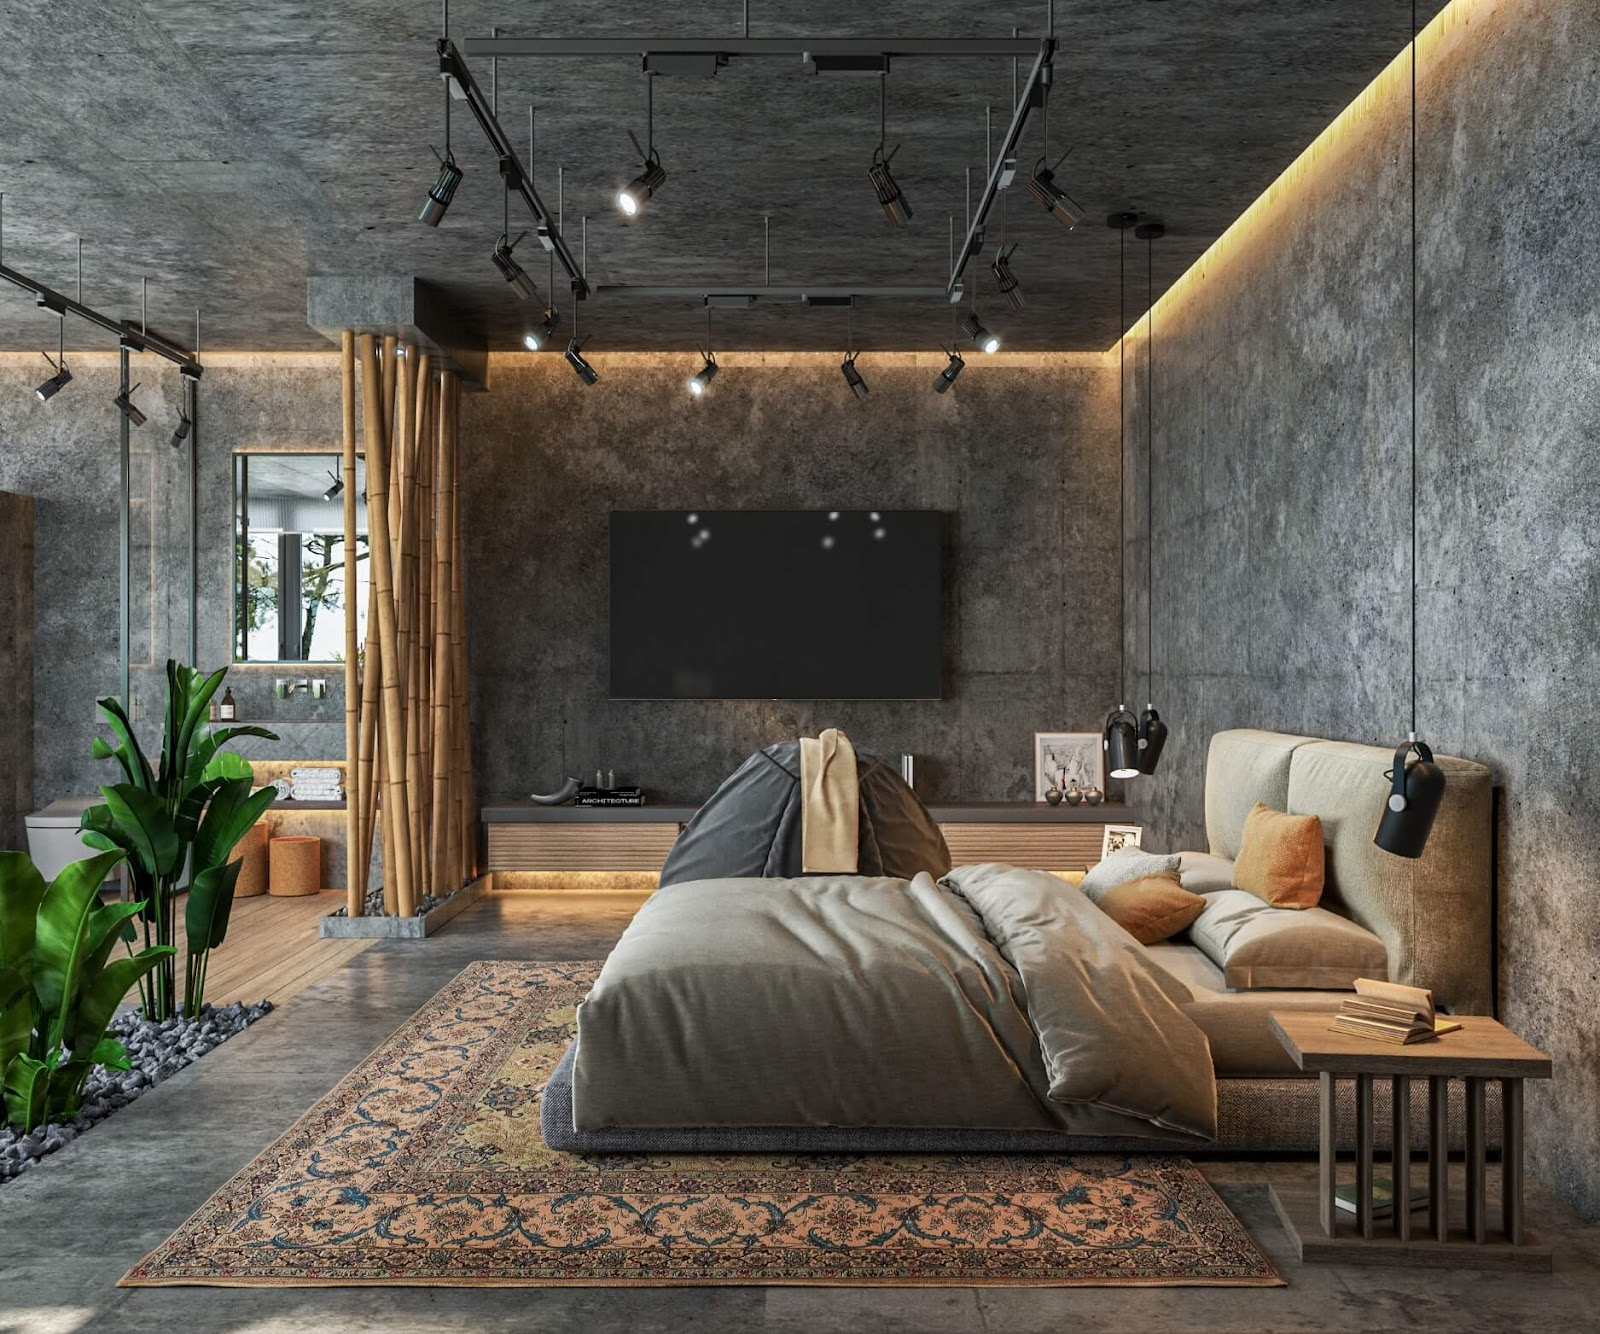 Stone Walls in a Modern Bedroom